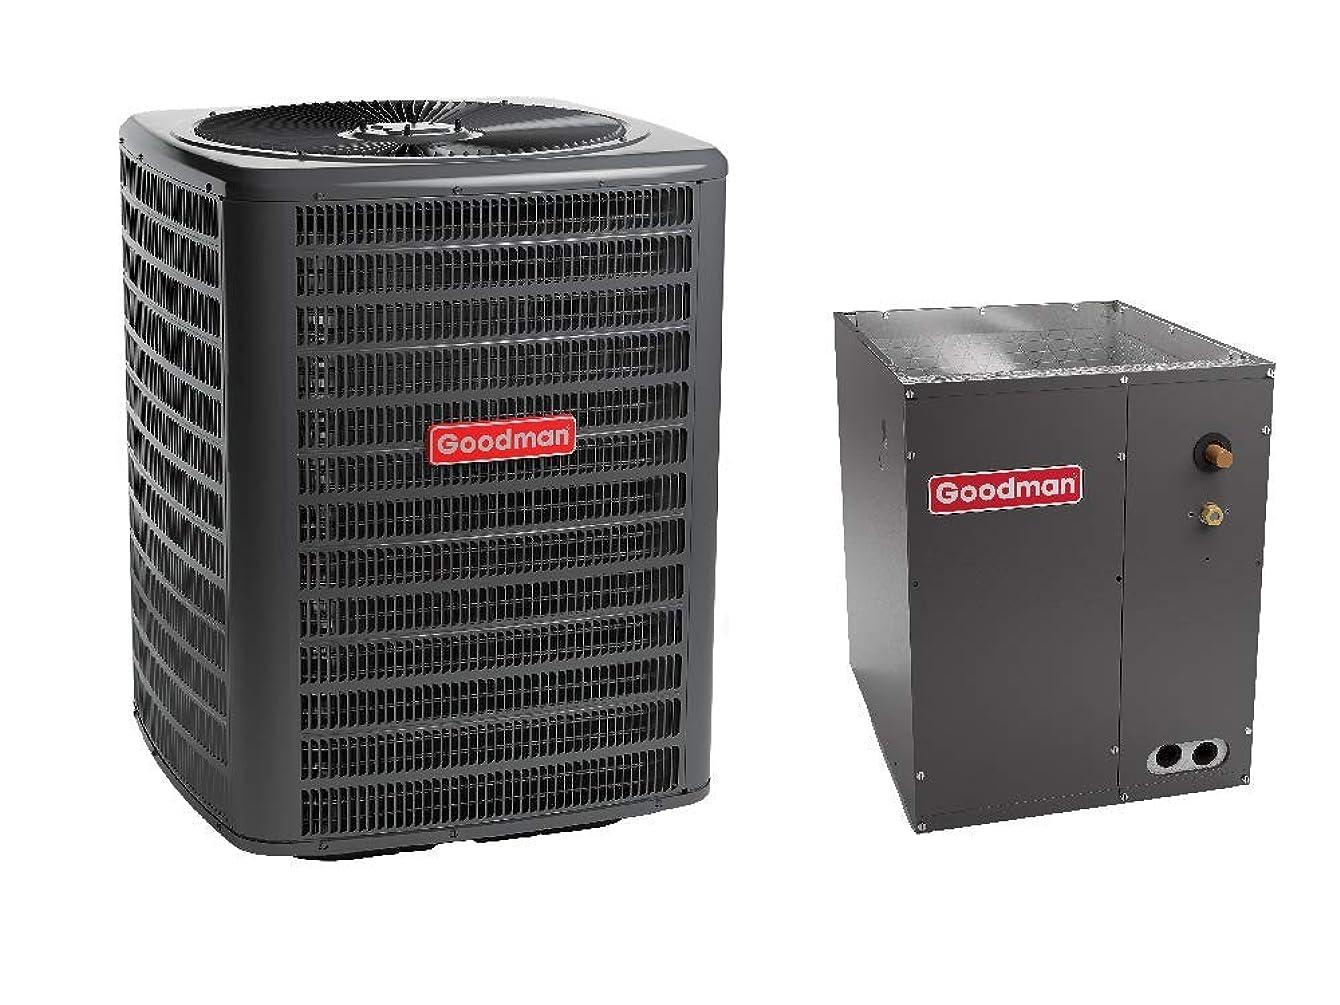 Goodman 4 Ton 14 SEER Air Conditioner GSX140481, Coil CAPF4860C6, Upflow, Downflow Coil CAPF4860C6